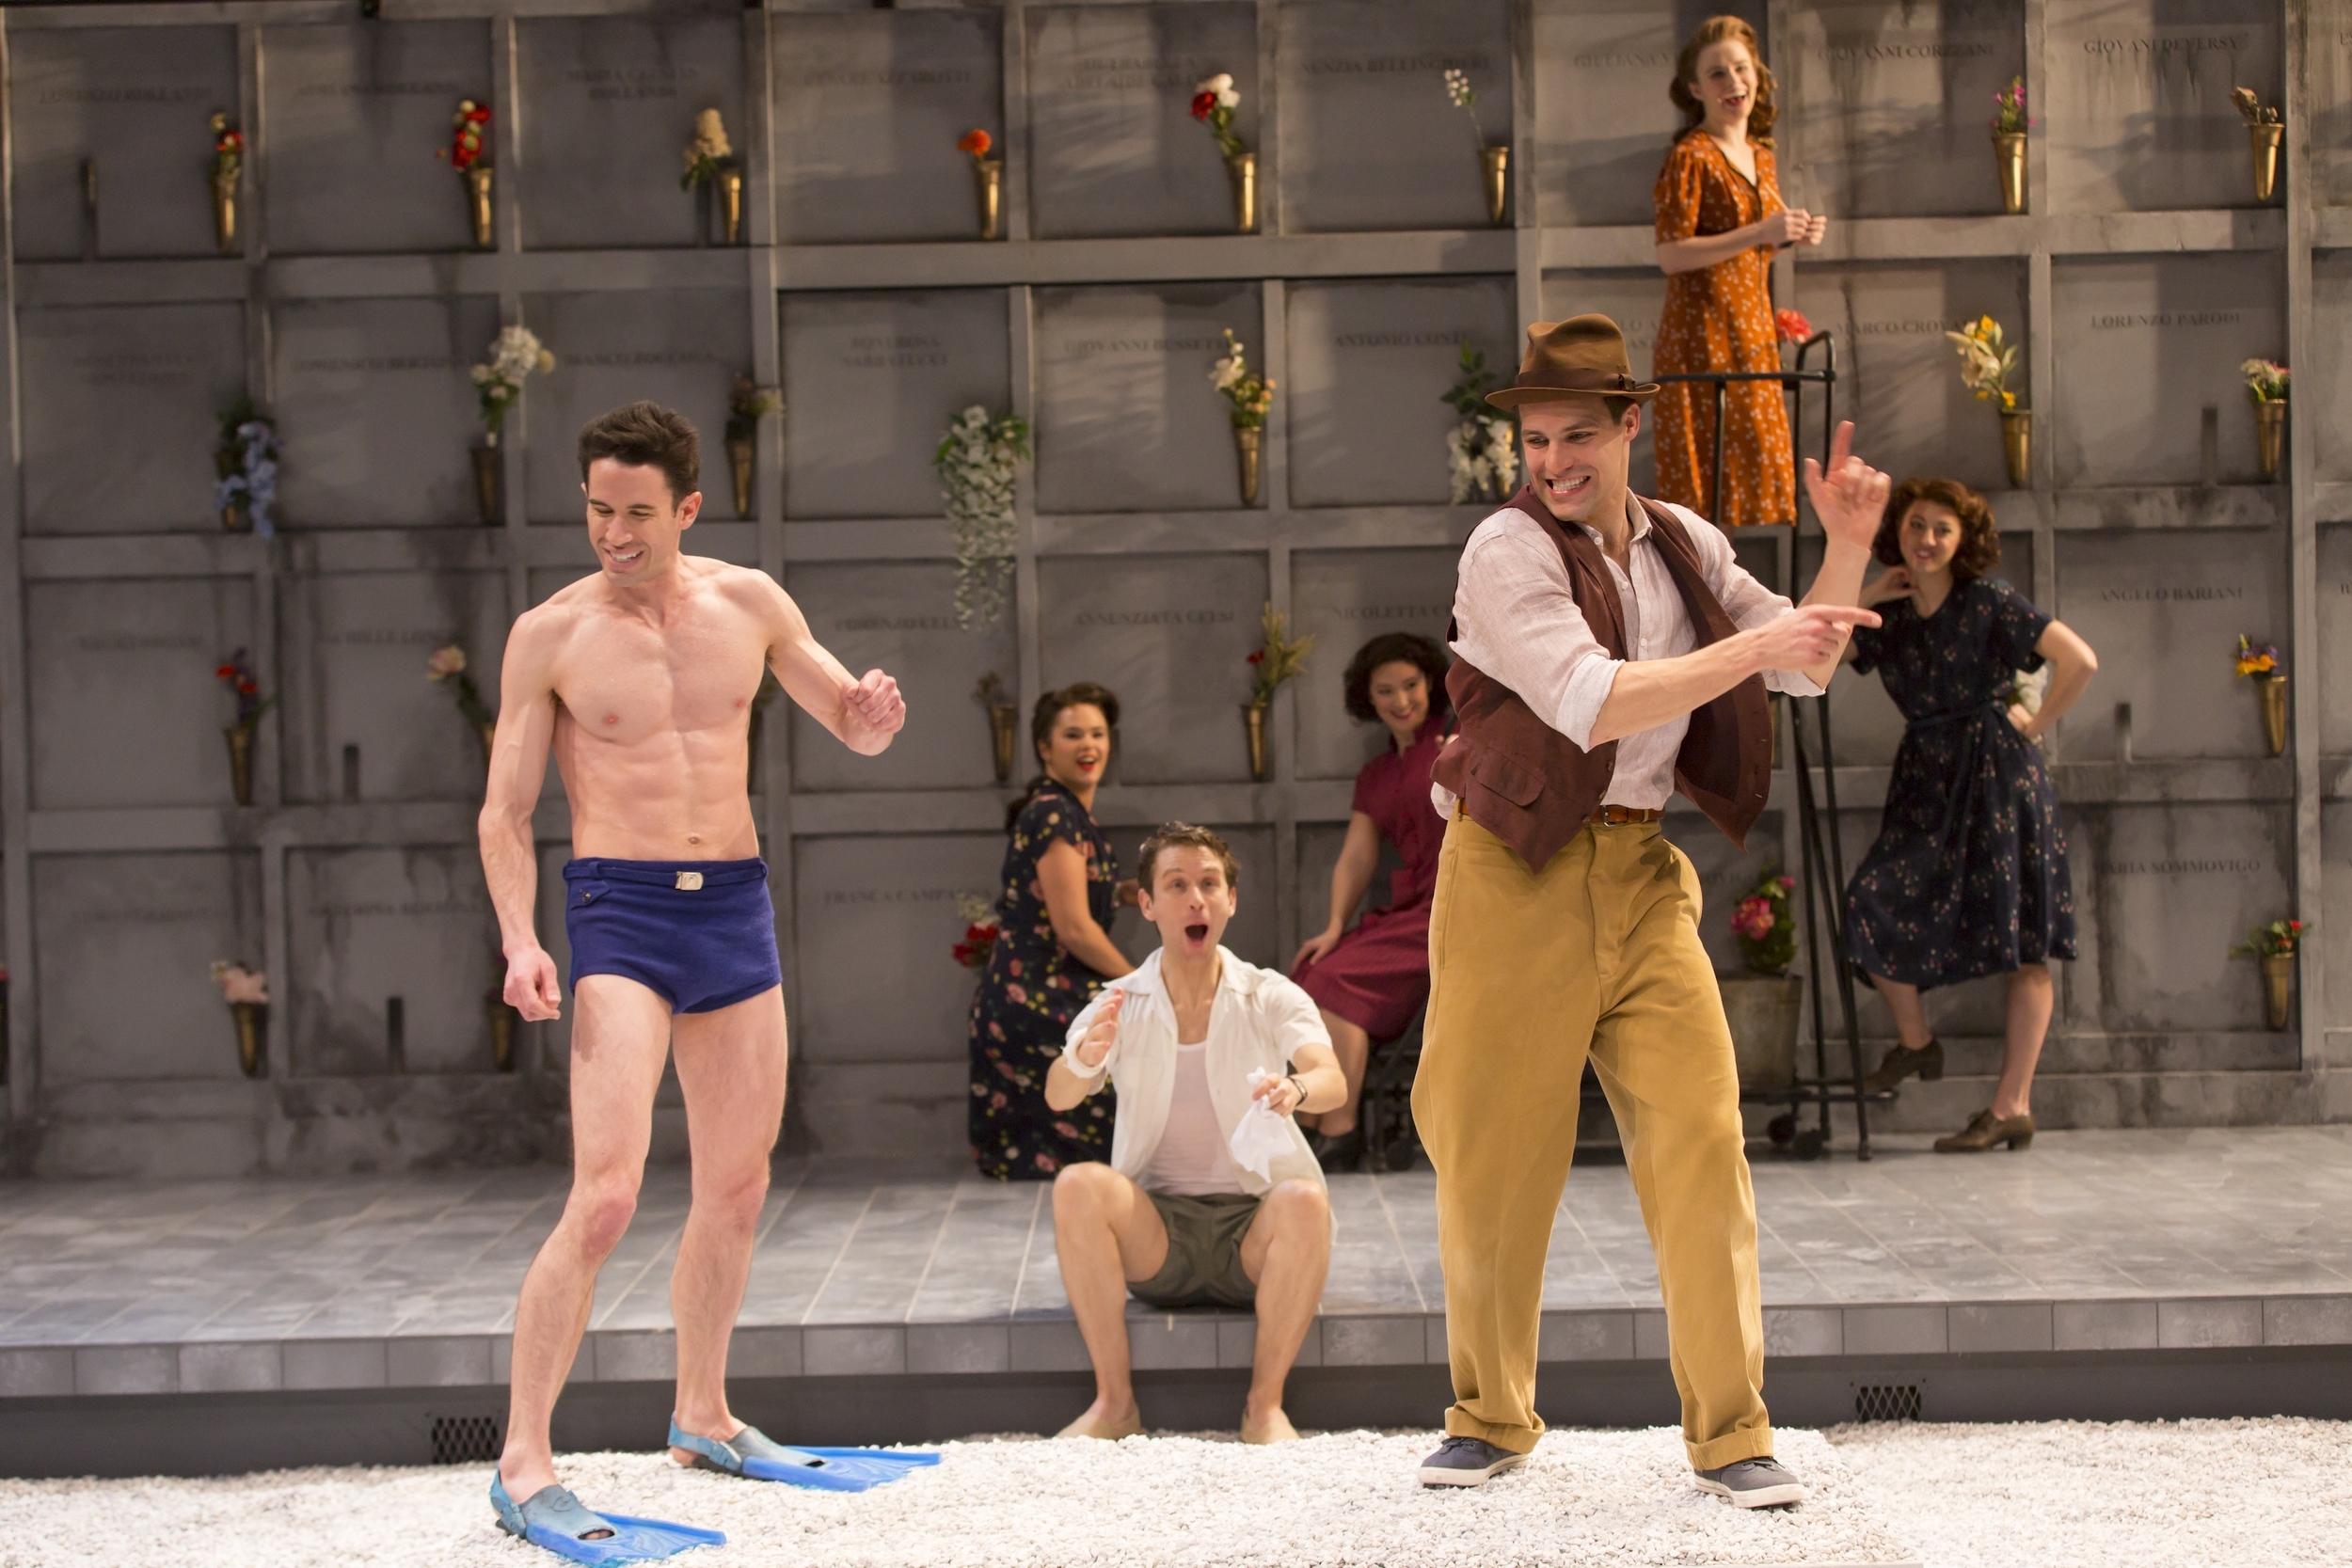 Wyatt Fenner (Mercutio), Alex Hanna (Benvolio), Chris Ghaffari (Romeo) and Ensemble